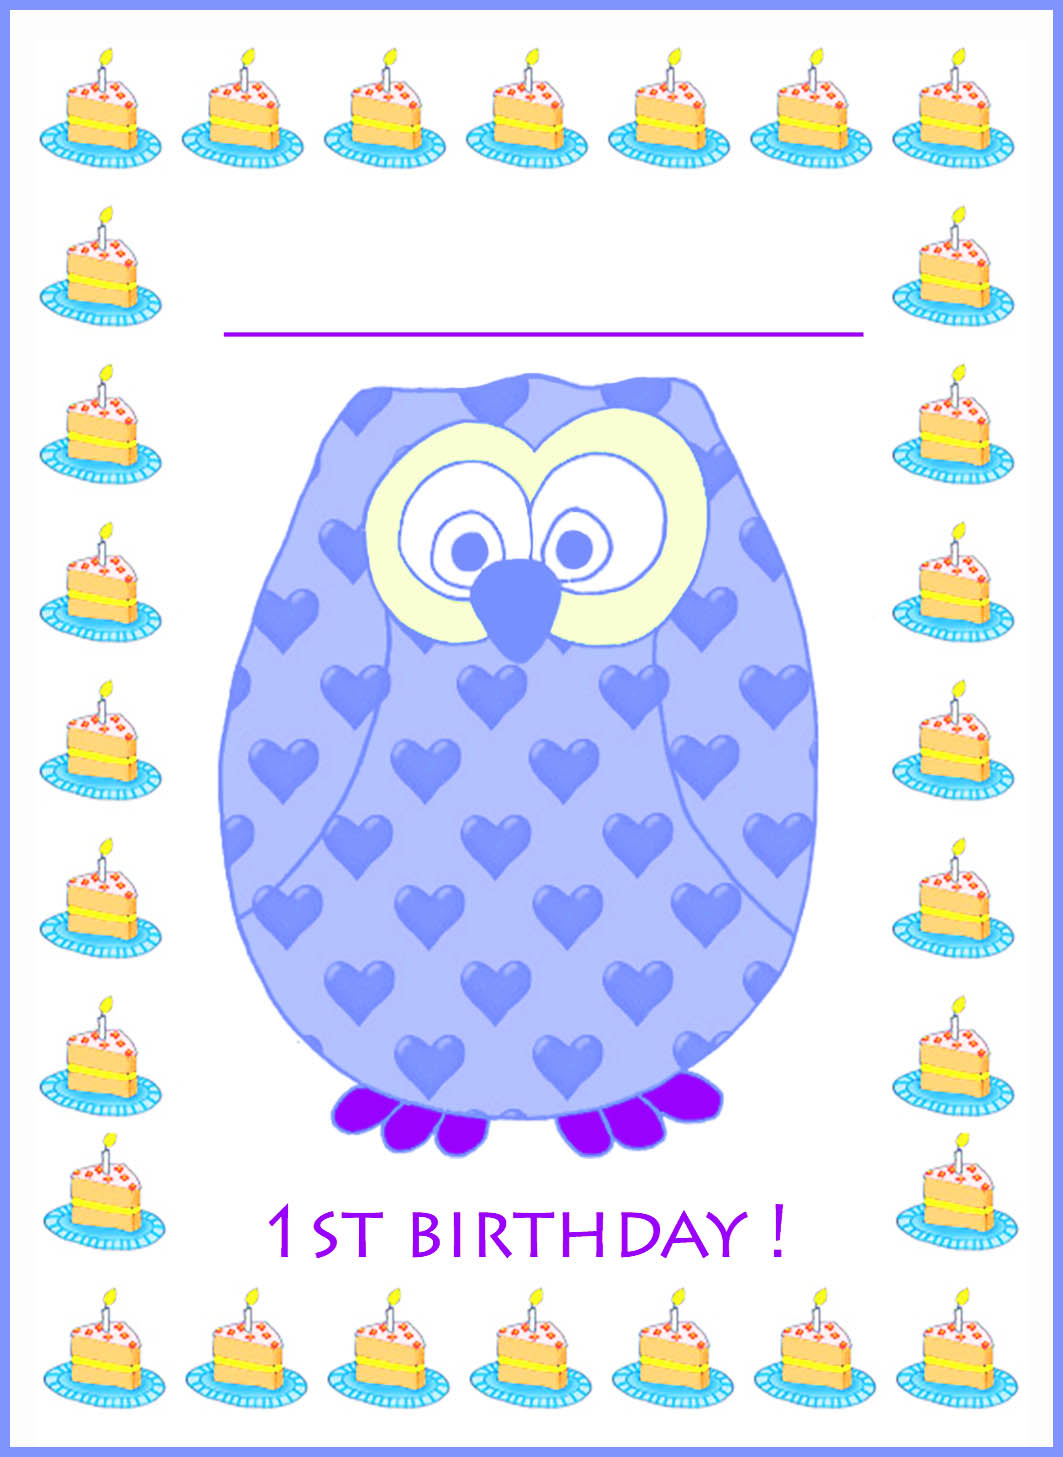 1st birthday card blue